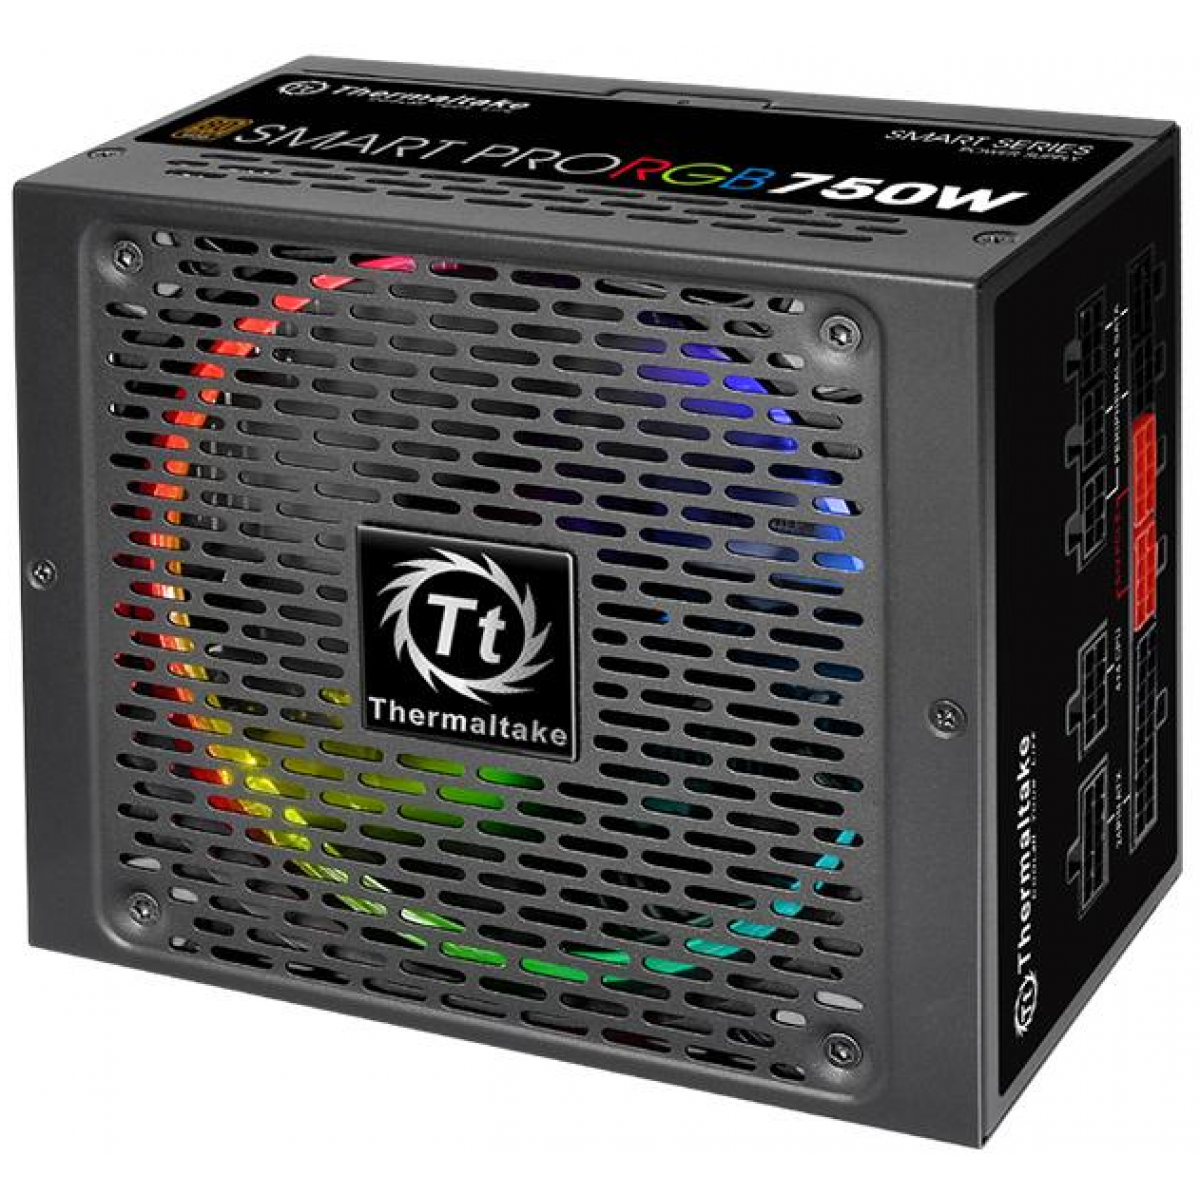 Fonte Thermaltake Smart Pro RGB 750W, 80 Plus Bronze, PFC Ativo, Full Modular, PS-SPR-0750FPCBUS-R